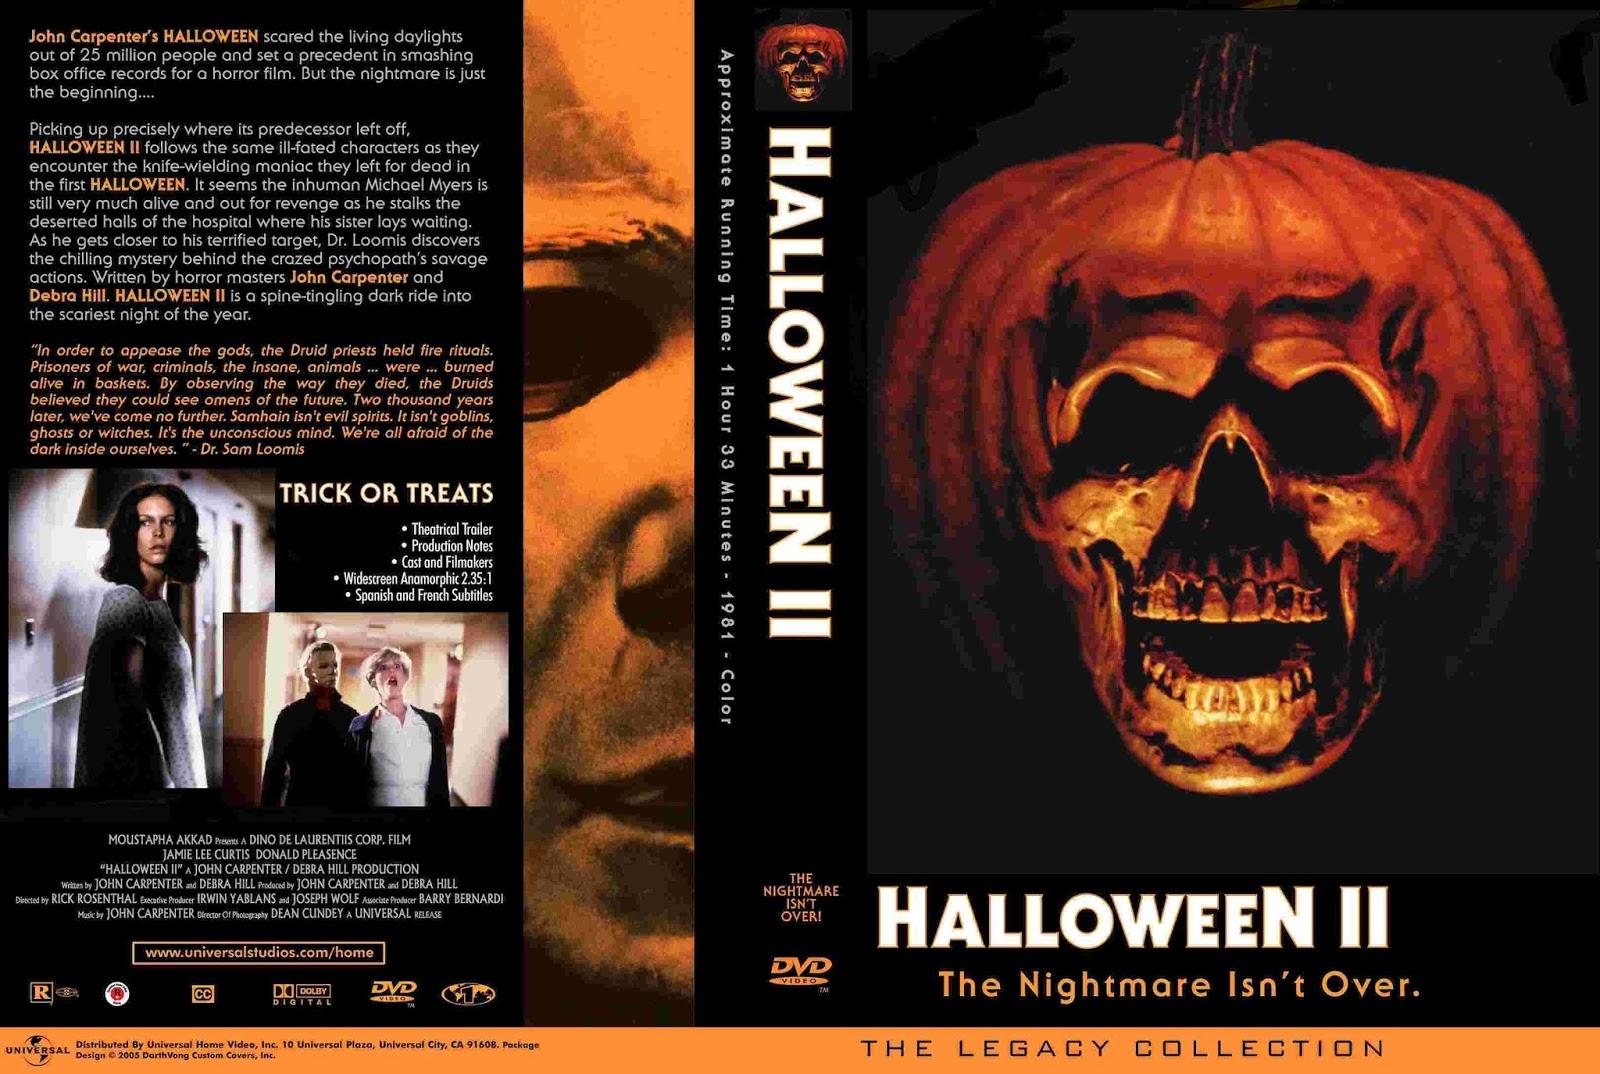 the horrors of halloween: halloween ii (1981) newspaper ads, vhs